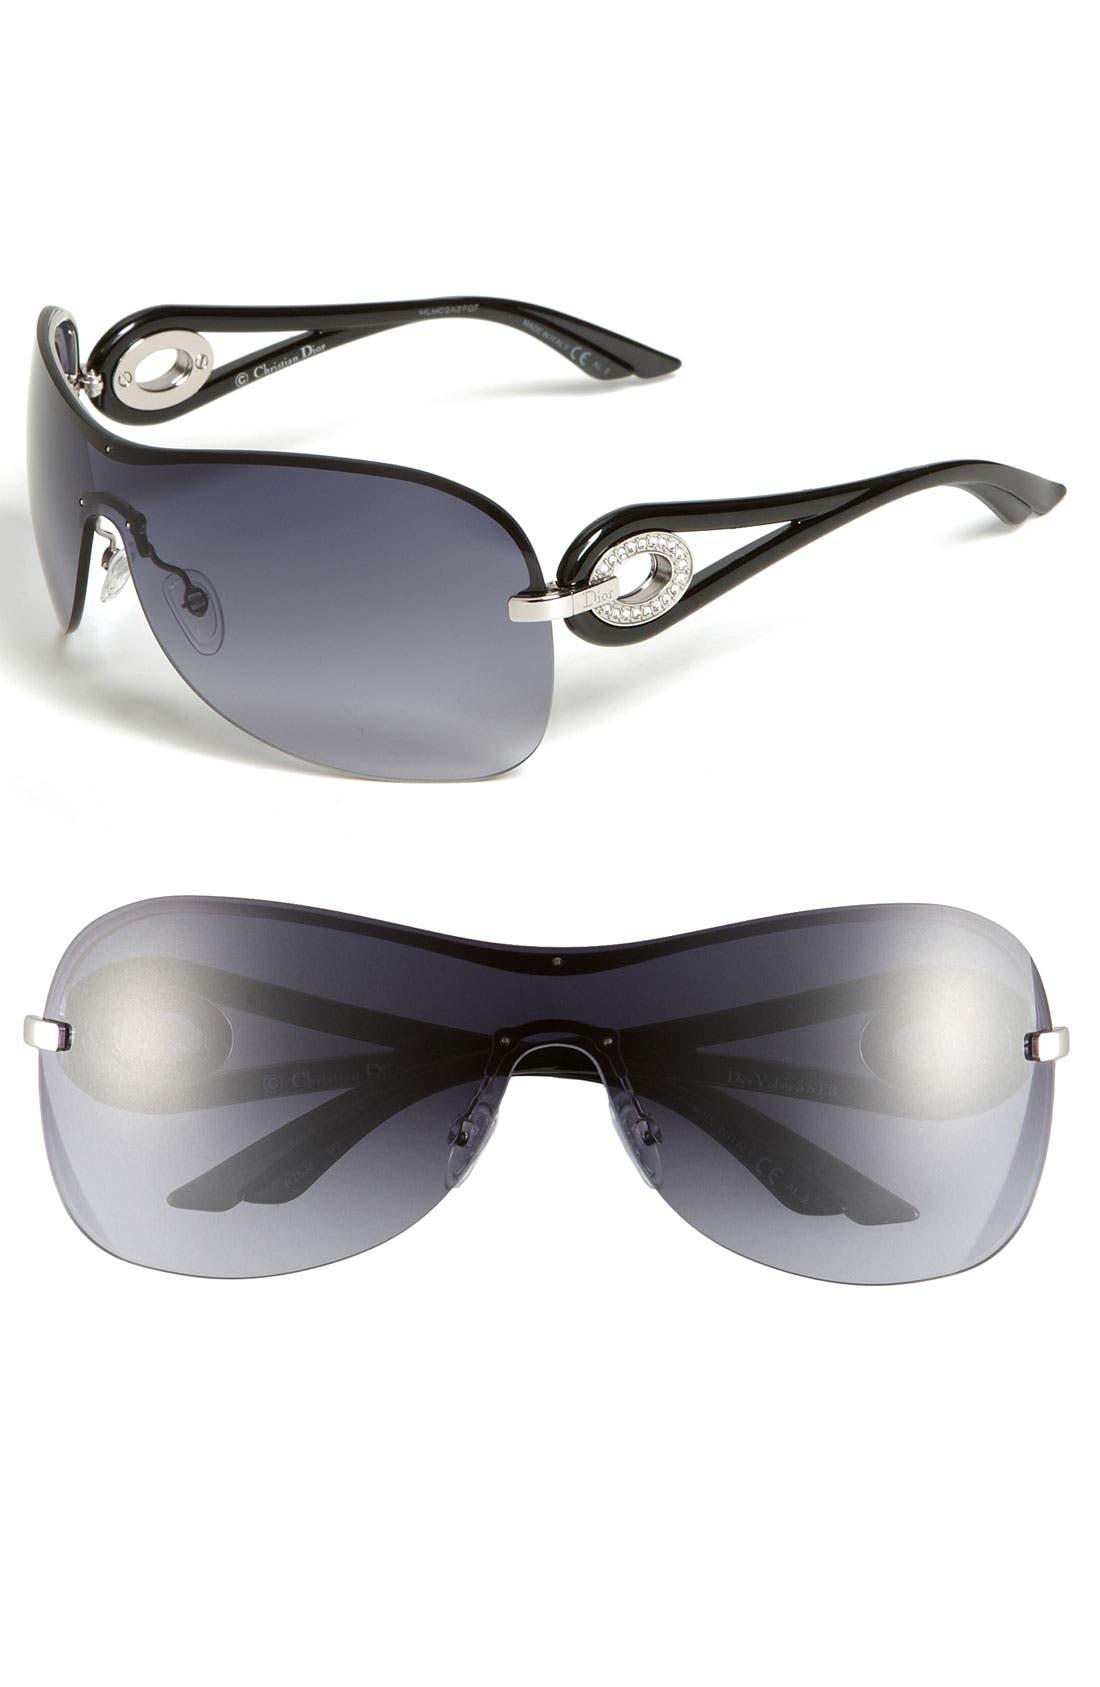 Main Image - Dior 'Volute 3' Rimless Shield Sunglasses